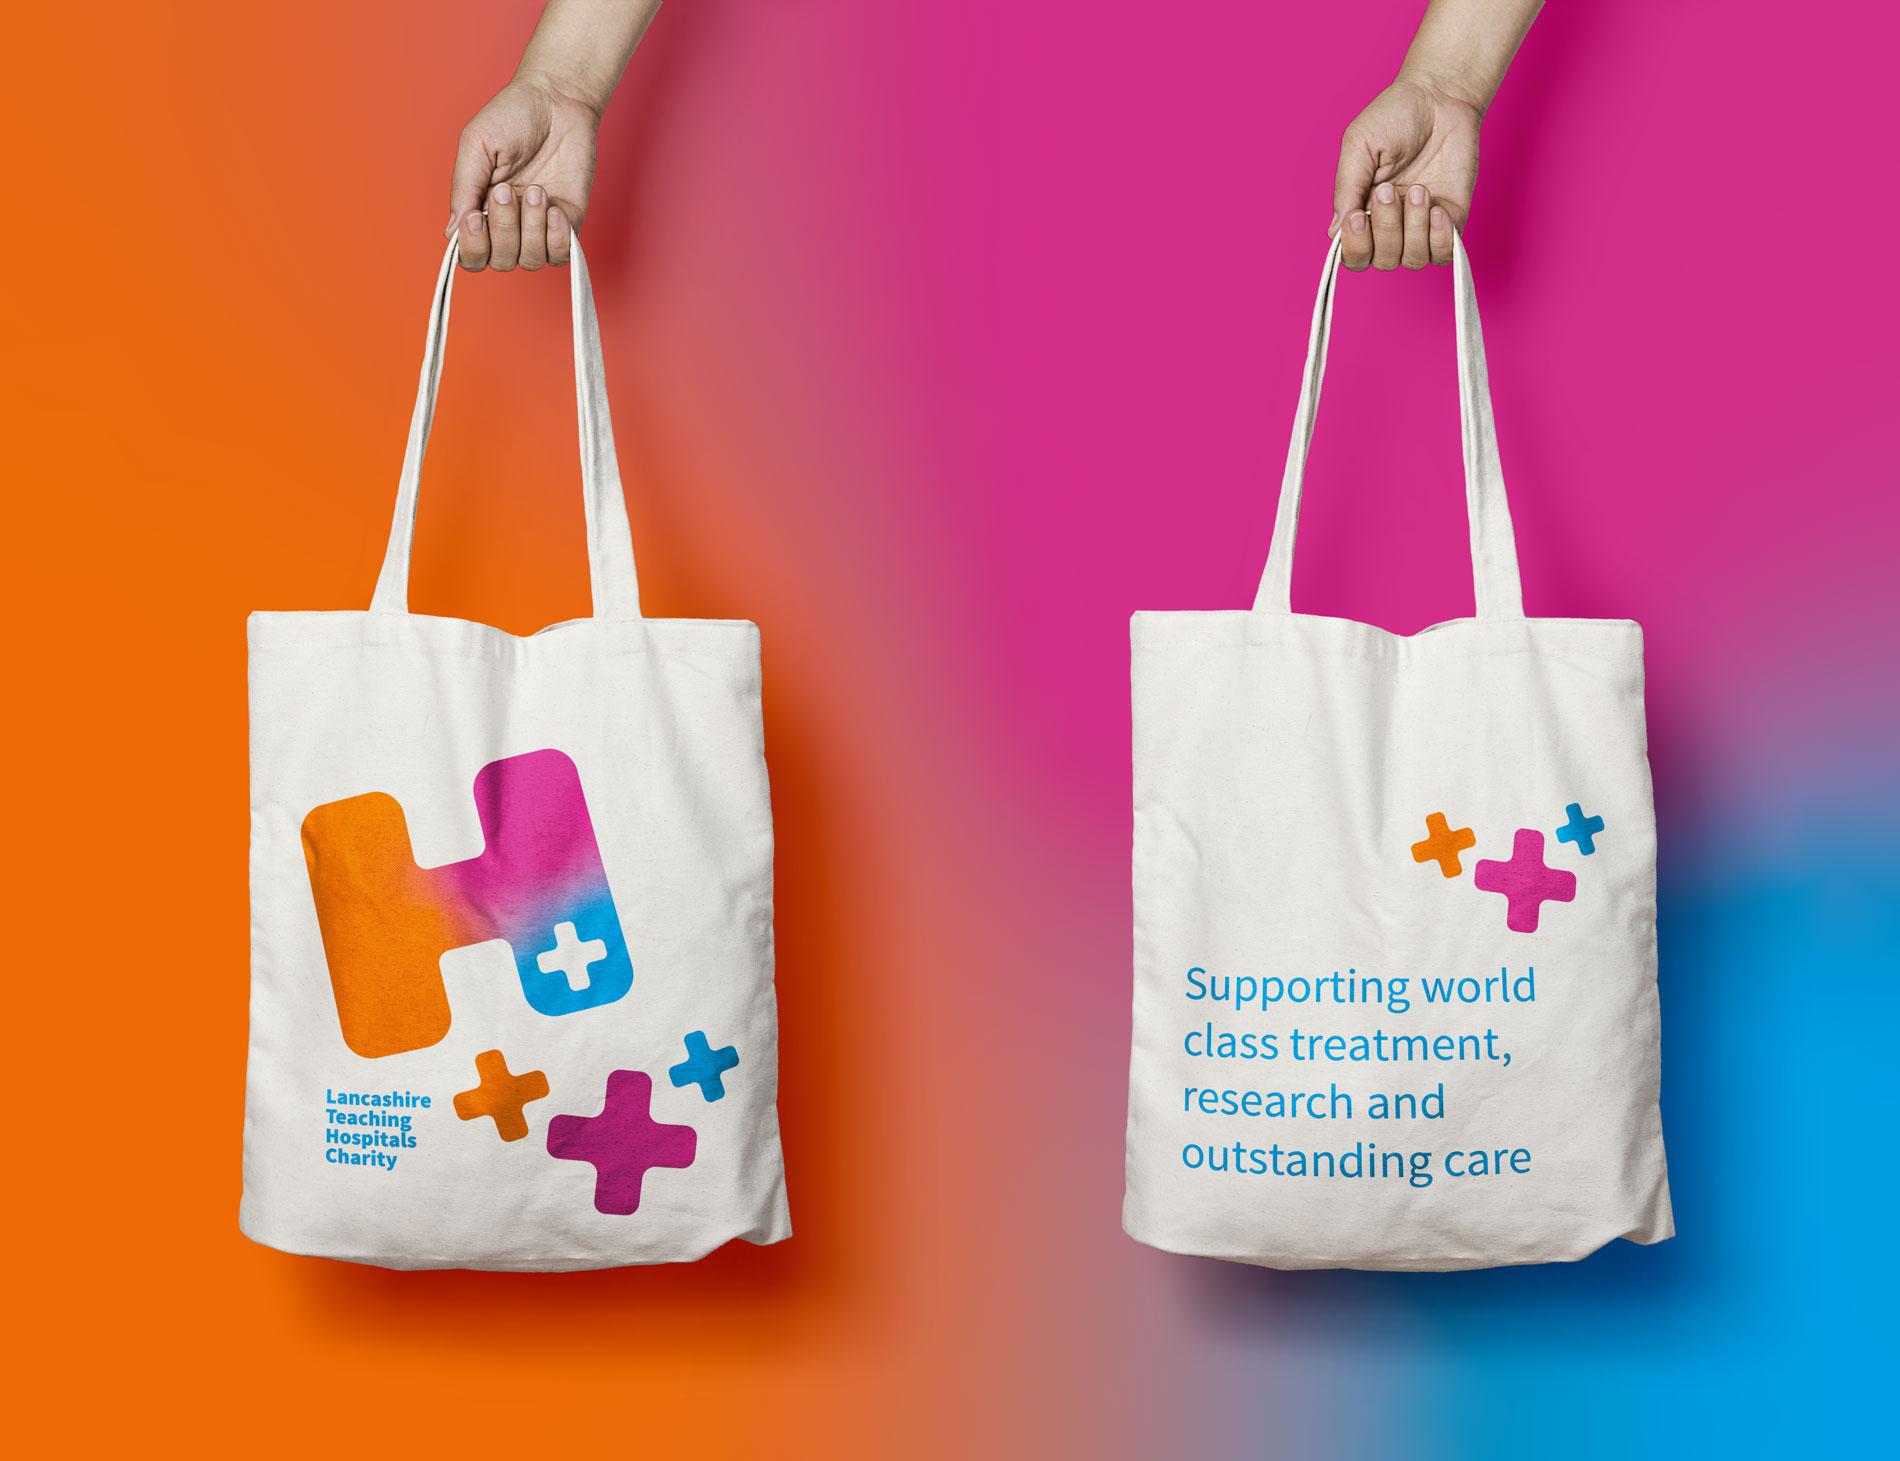 Lancashire Teaching Hospitals Charity Tote Bag Design